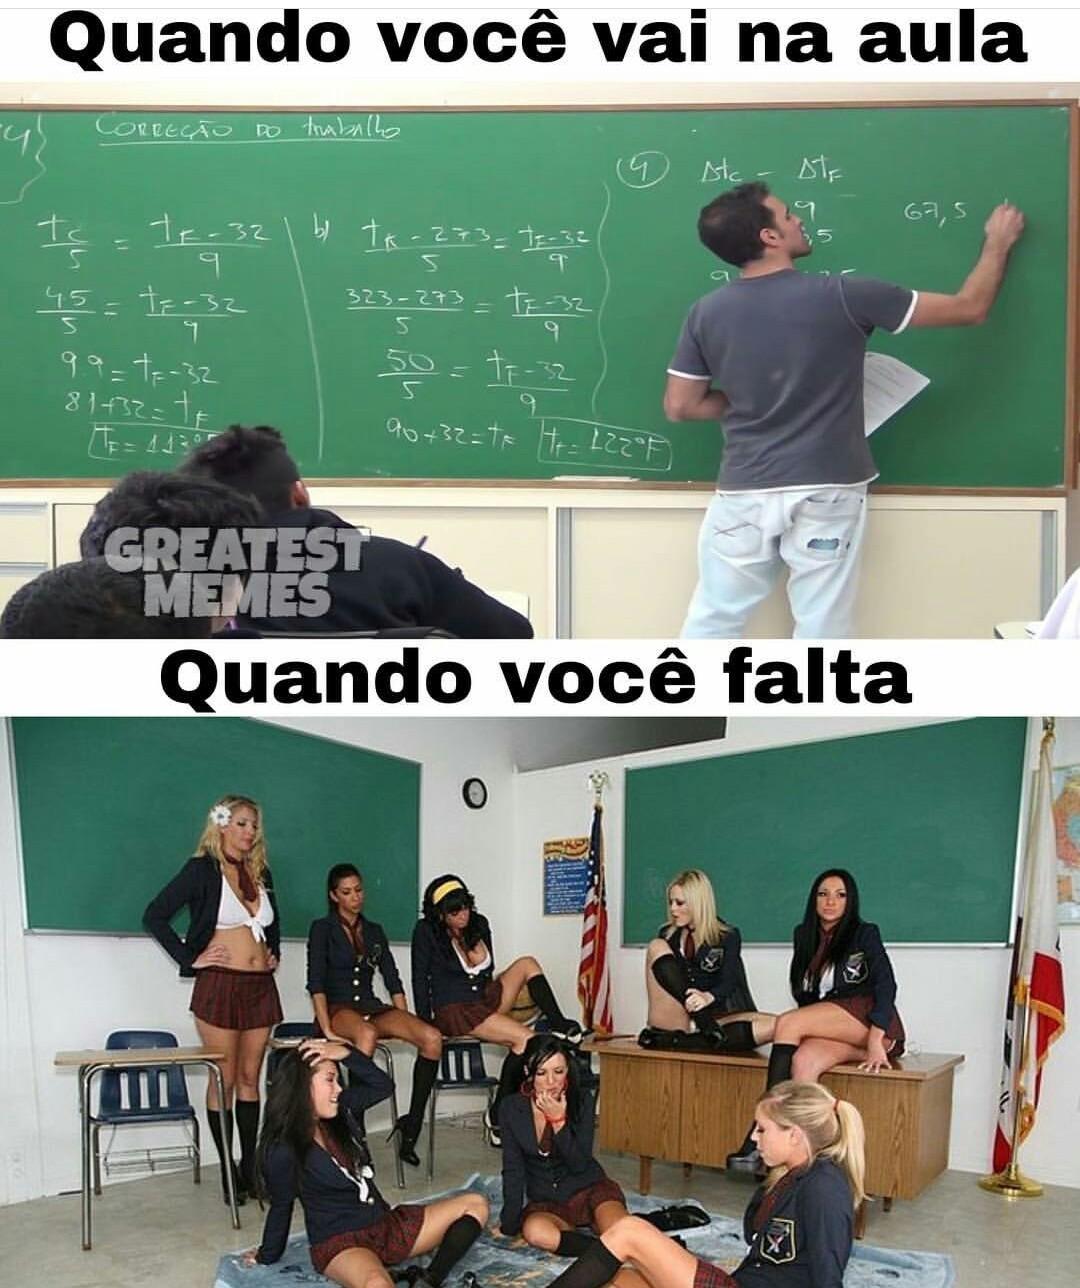 School_lesbic_teen_girls_group_fuck - meme